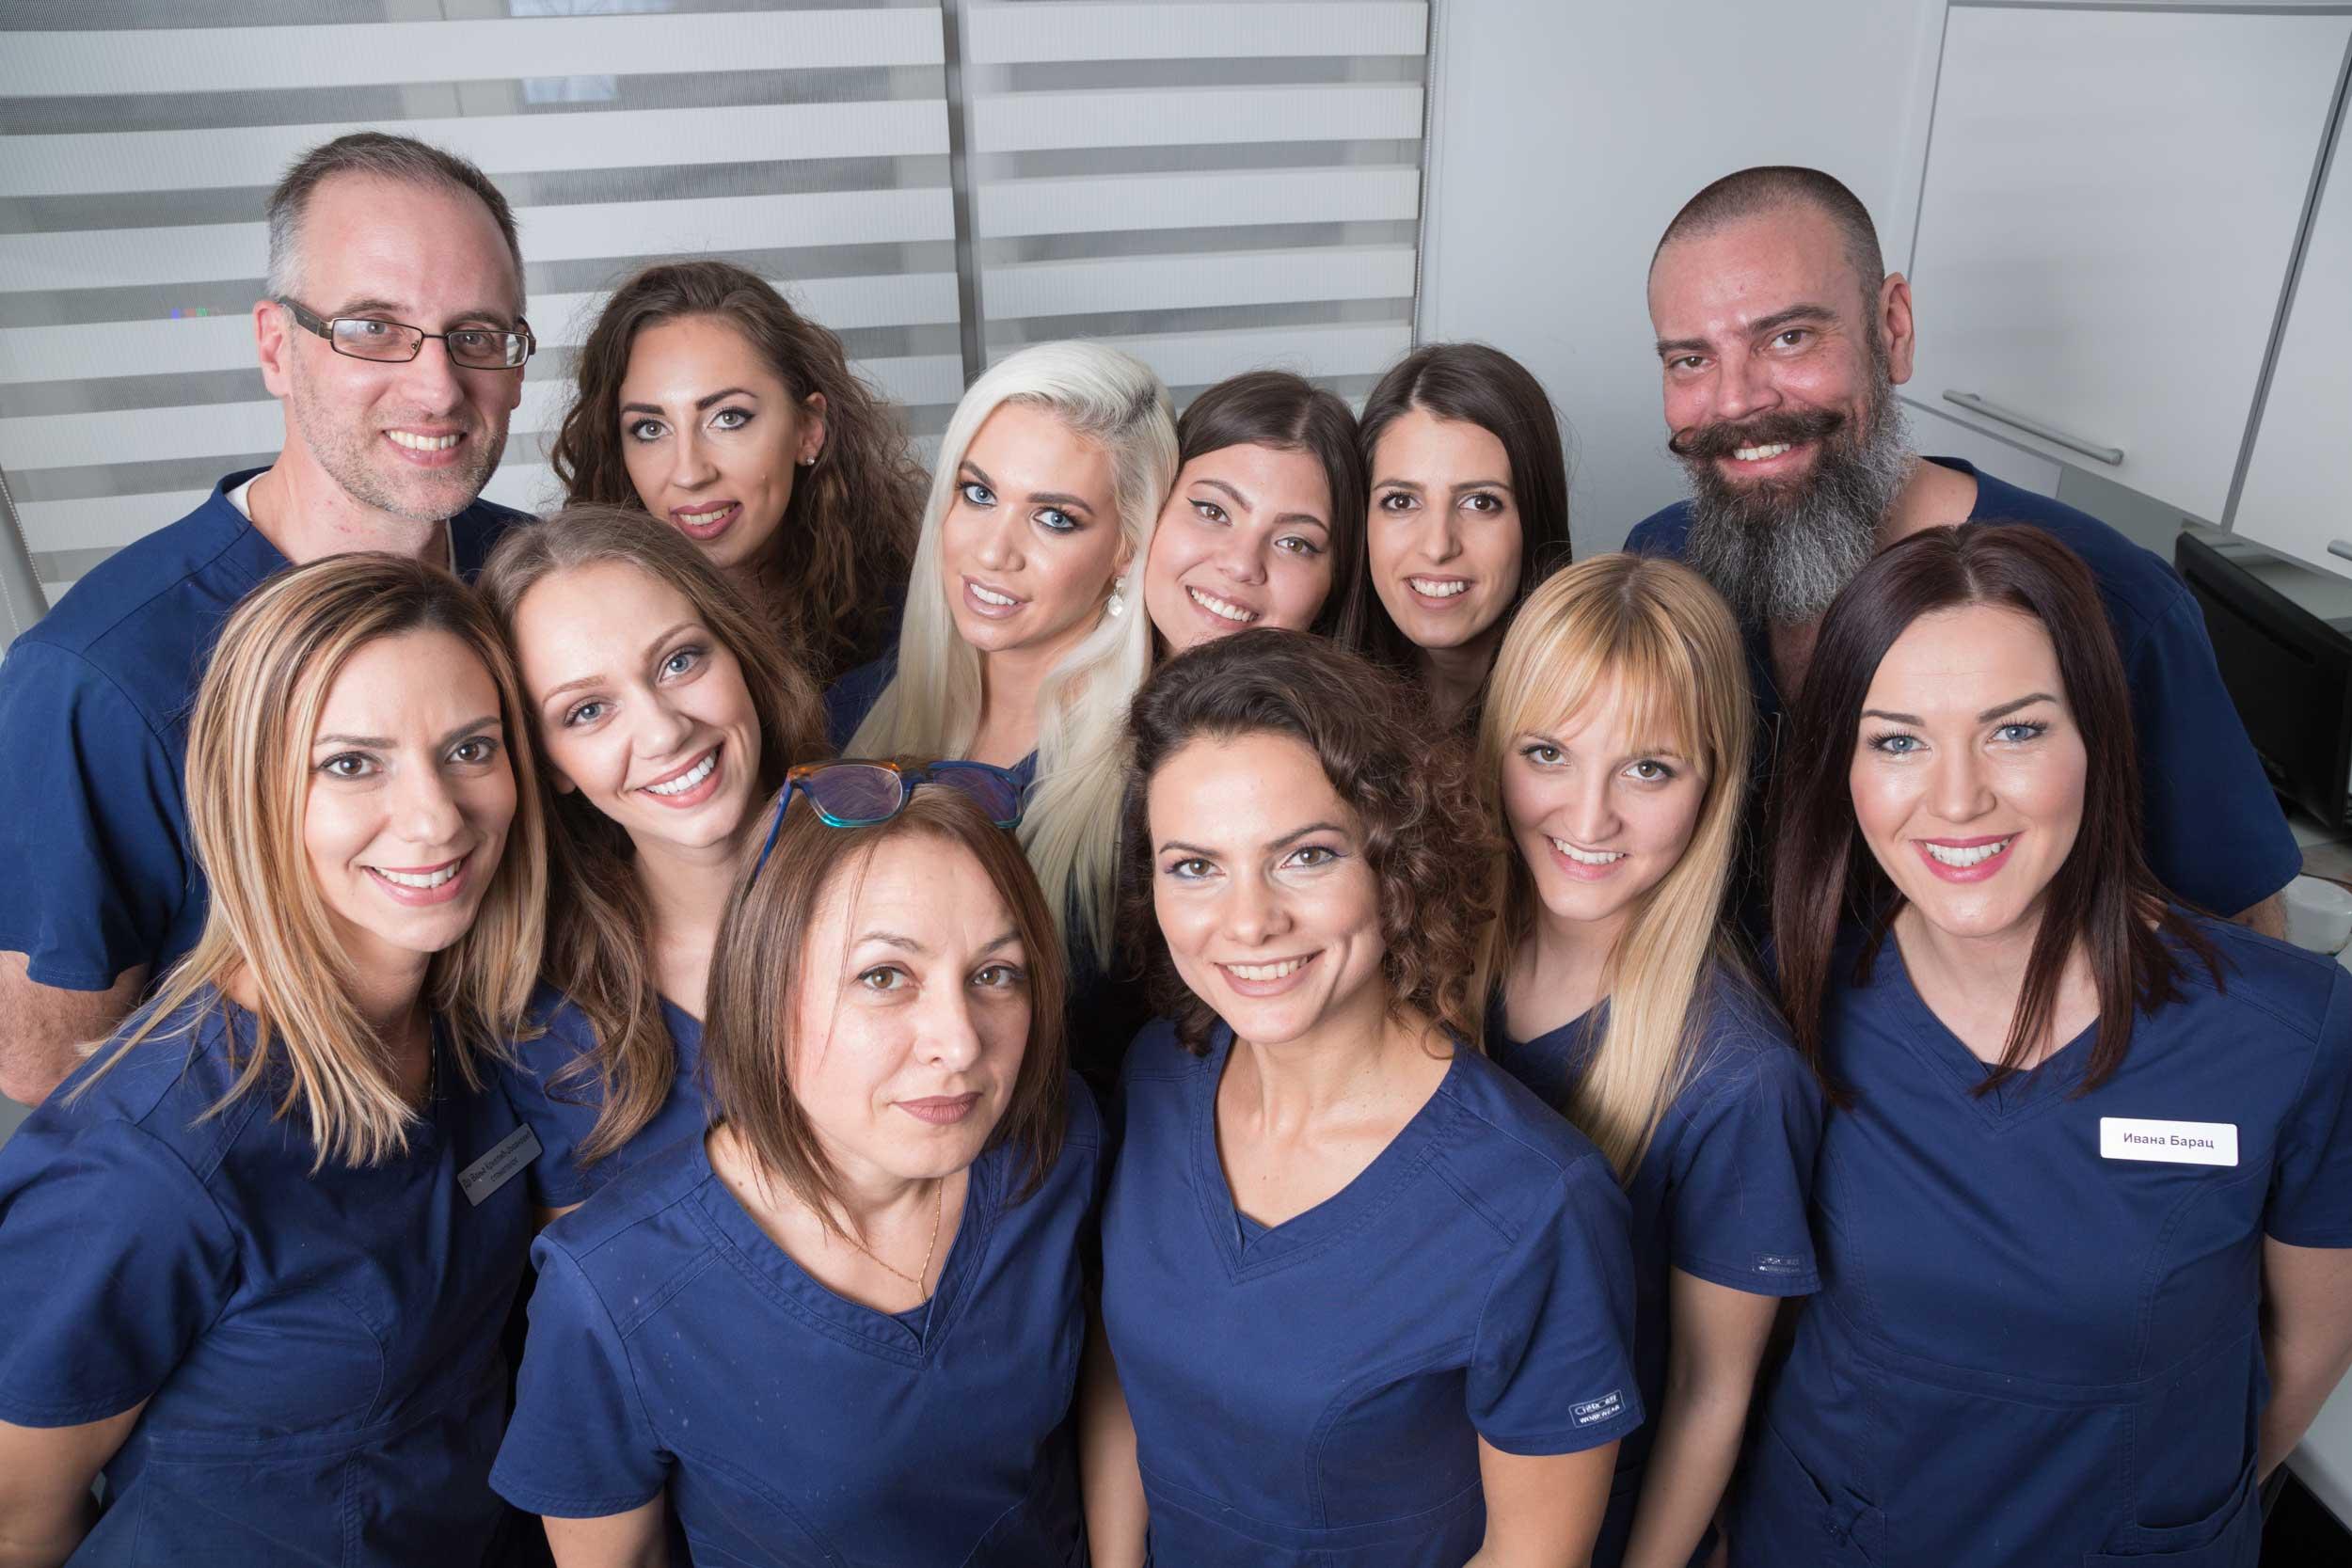 stomatoloska-ordinacija-vunjak-dental-clinic-vunjak-tim-12